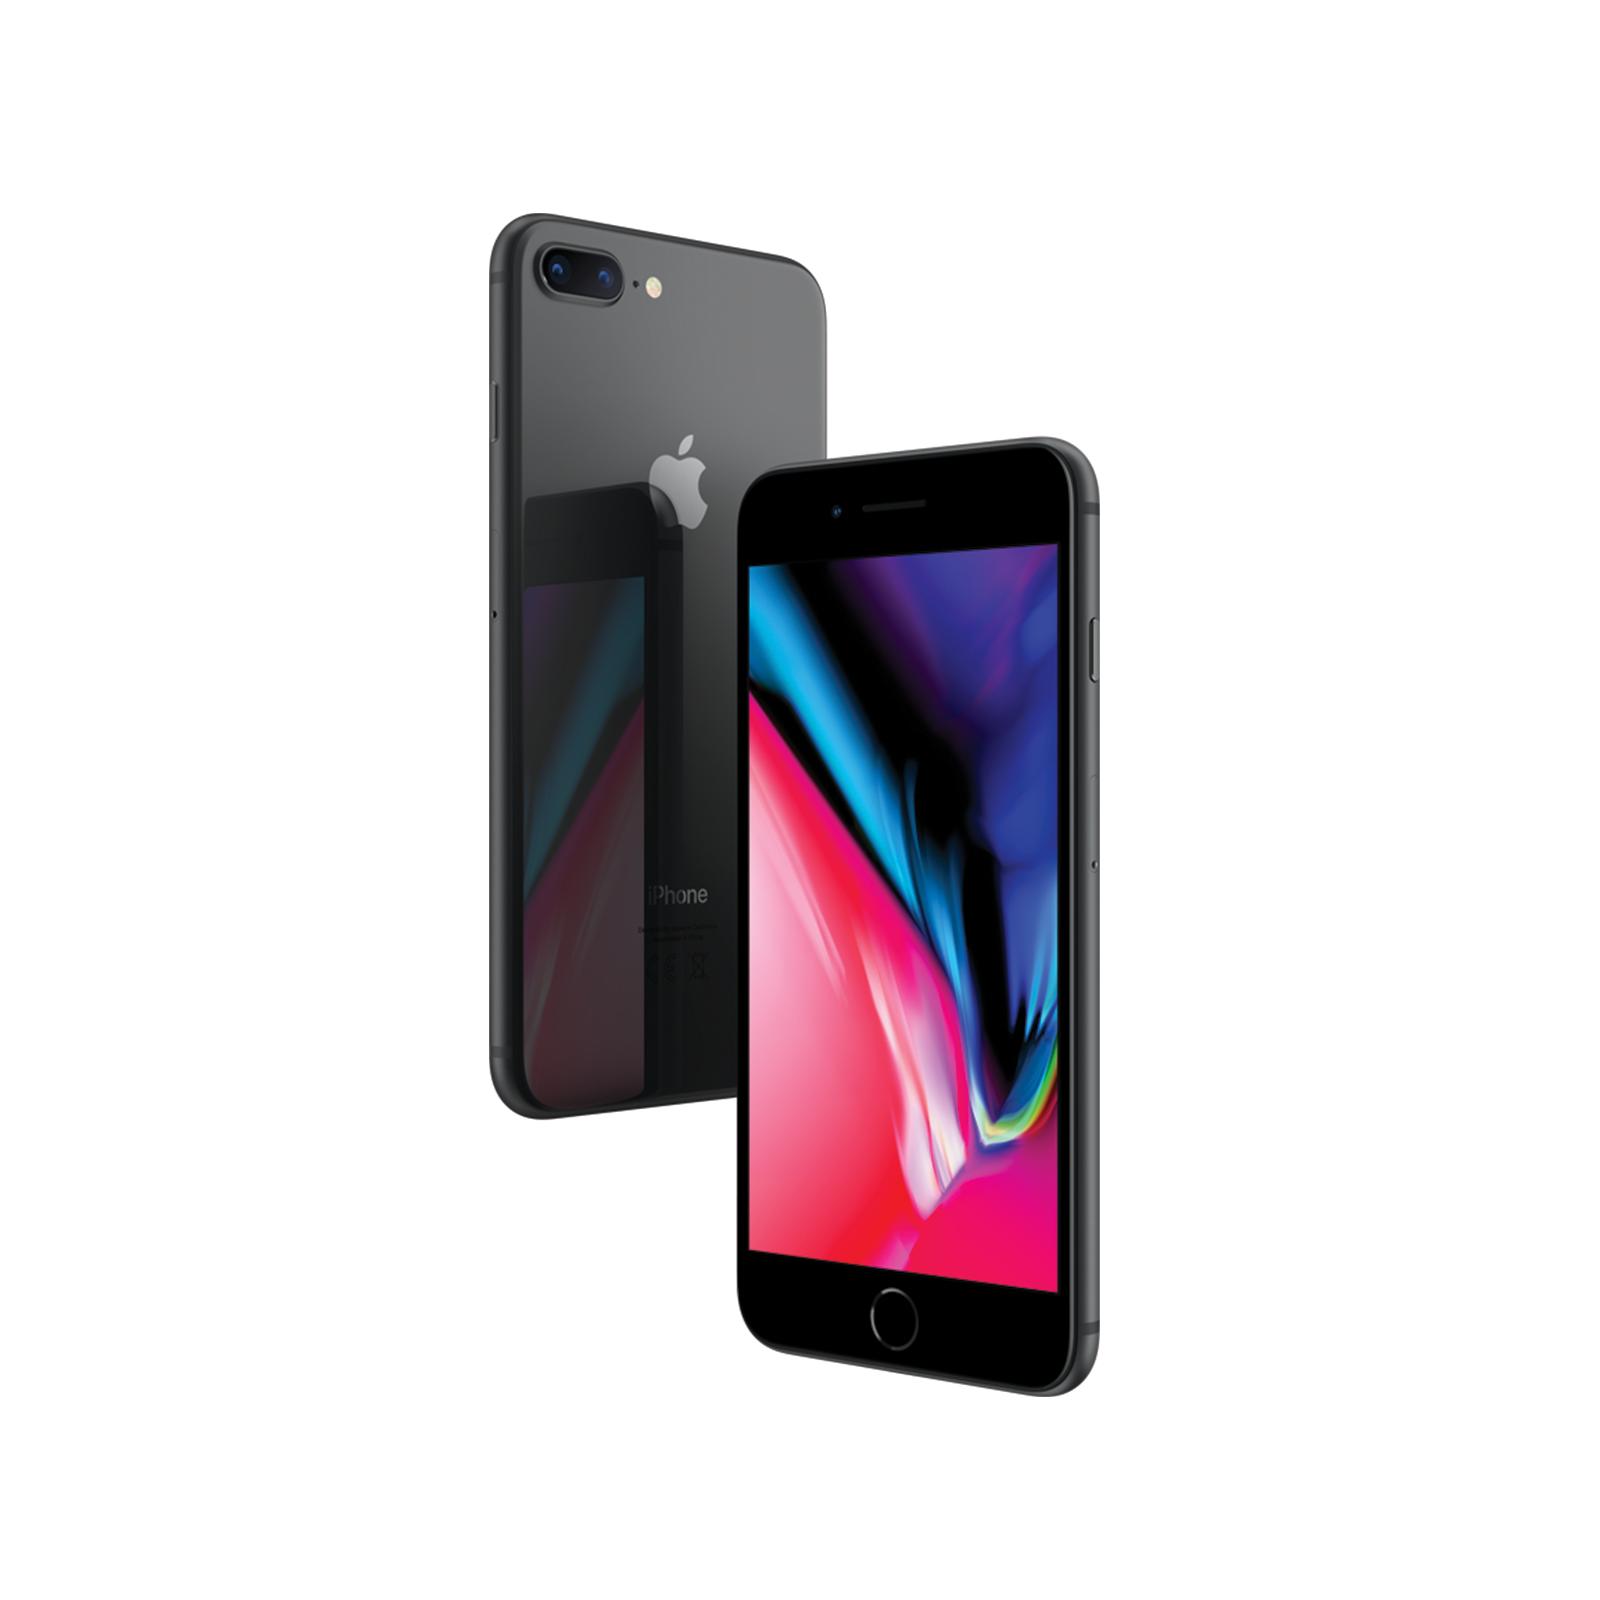 پلاس-گوشي-موبايل-اپل-آیفون-ایت-Apple-iPhone-8-plus.....png